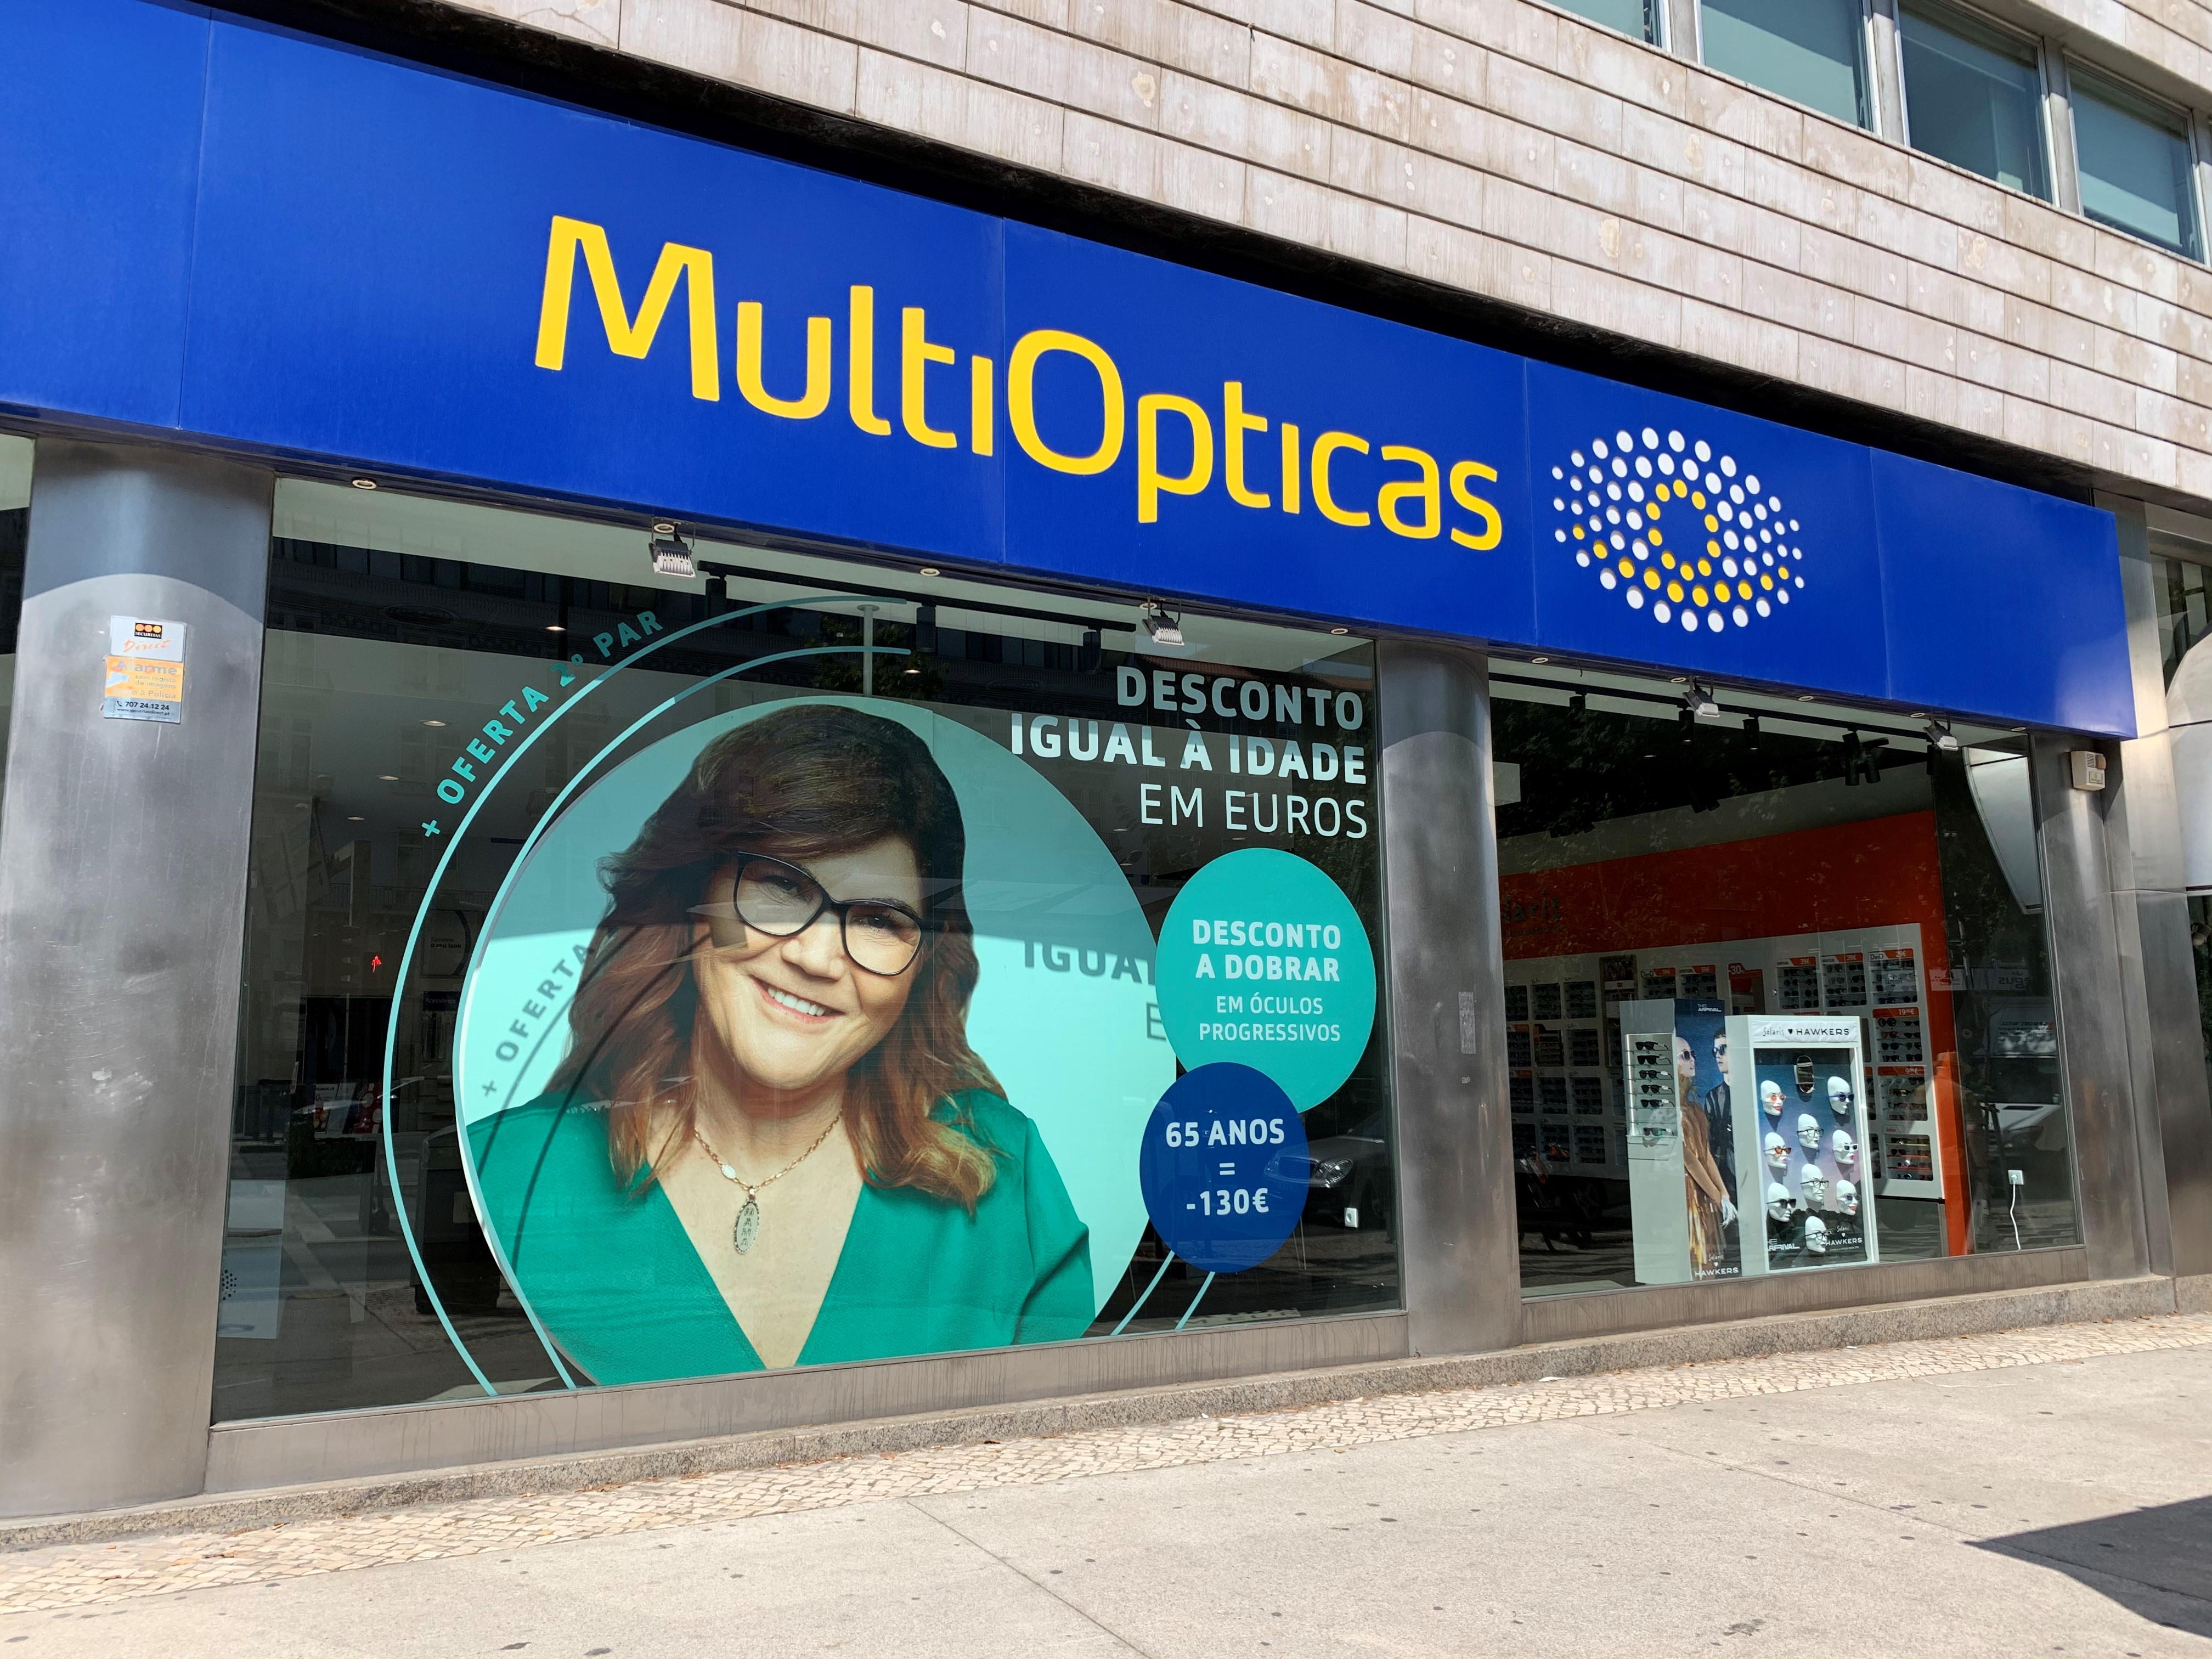 Ópticas MultiOpticas Av. República Lisboa